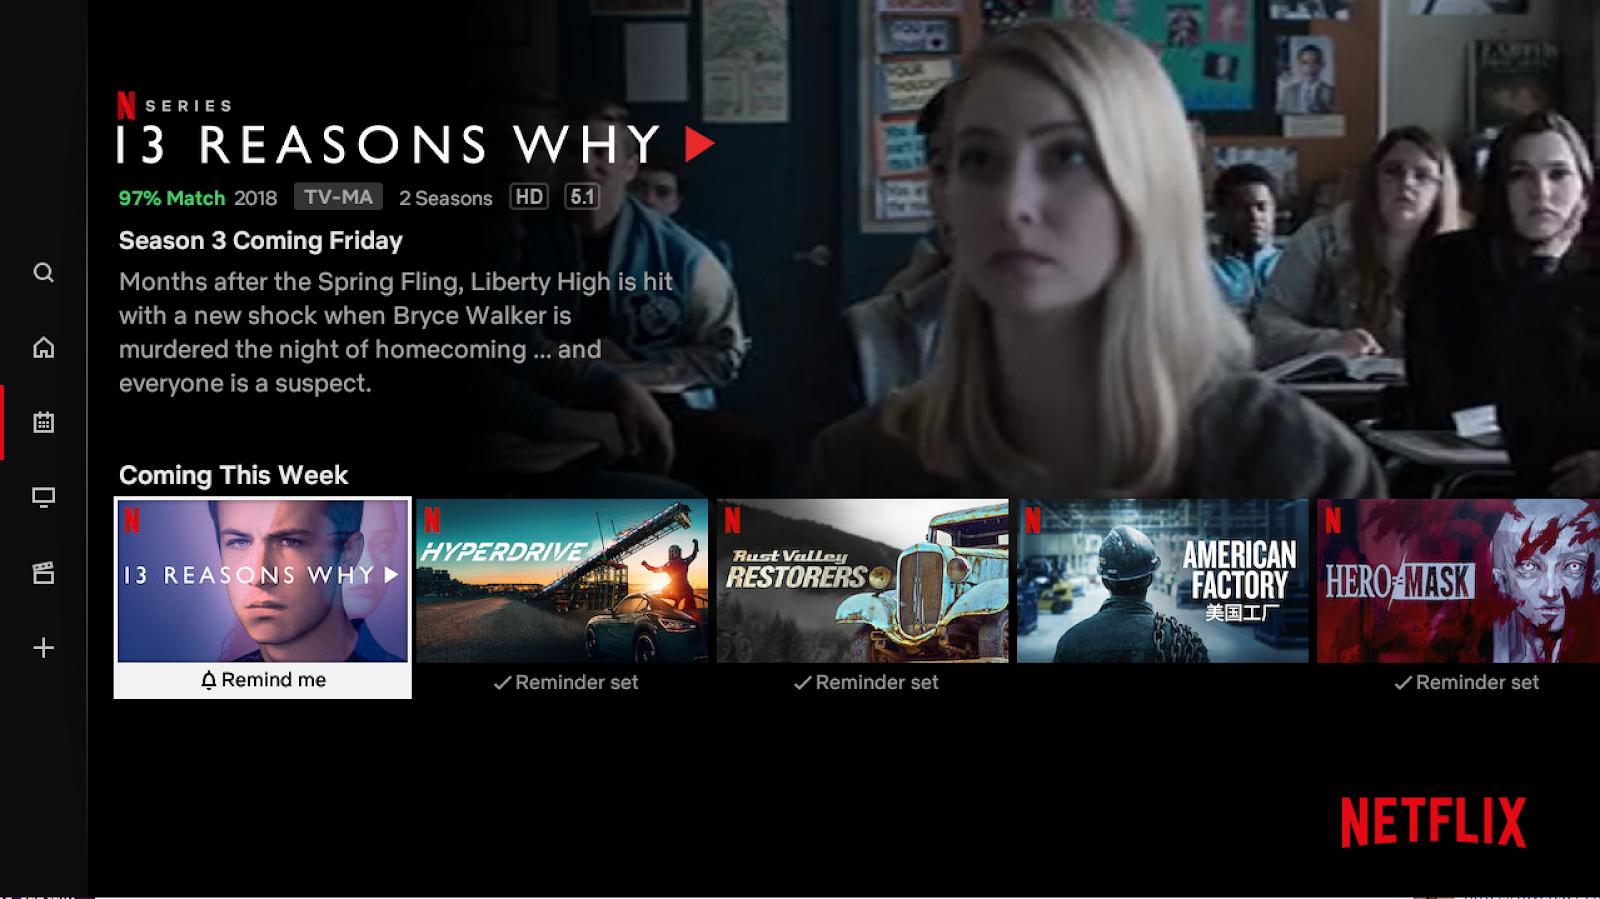 「Netflix 作品」の画像検索結果